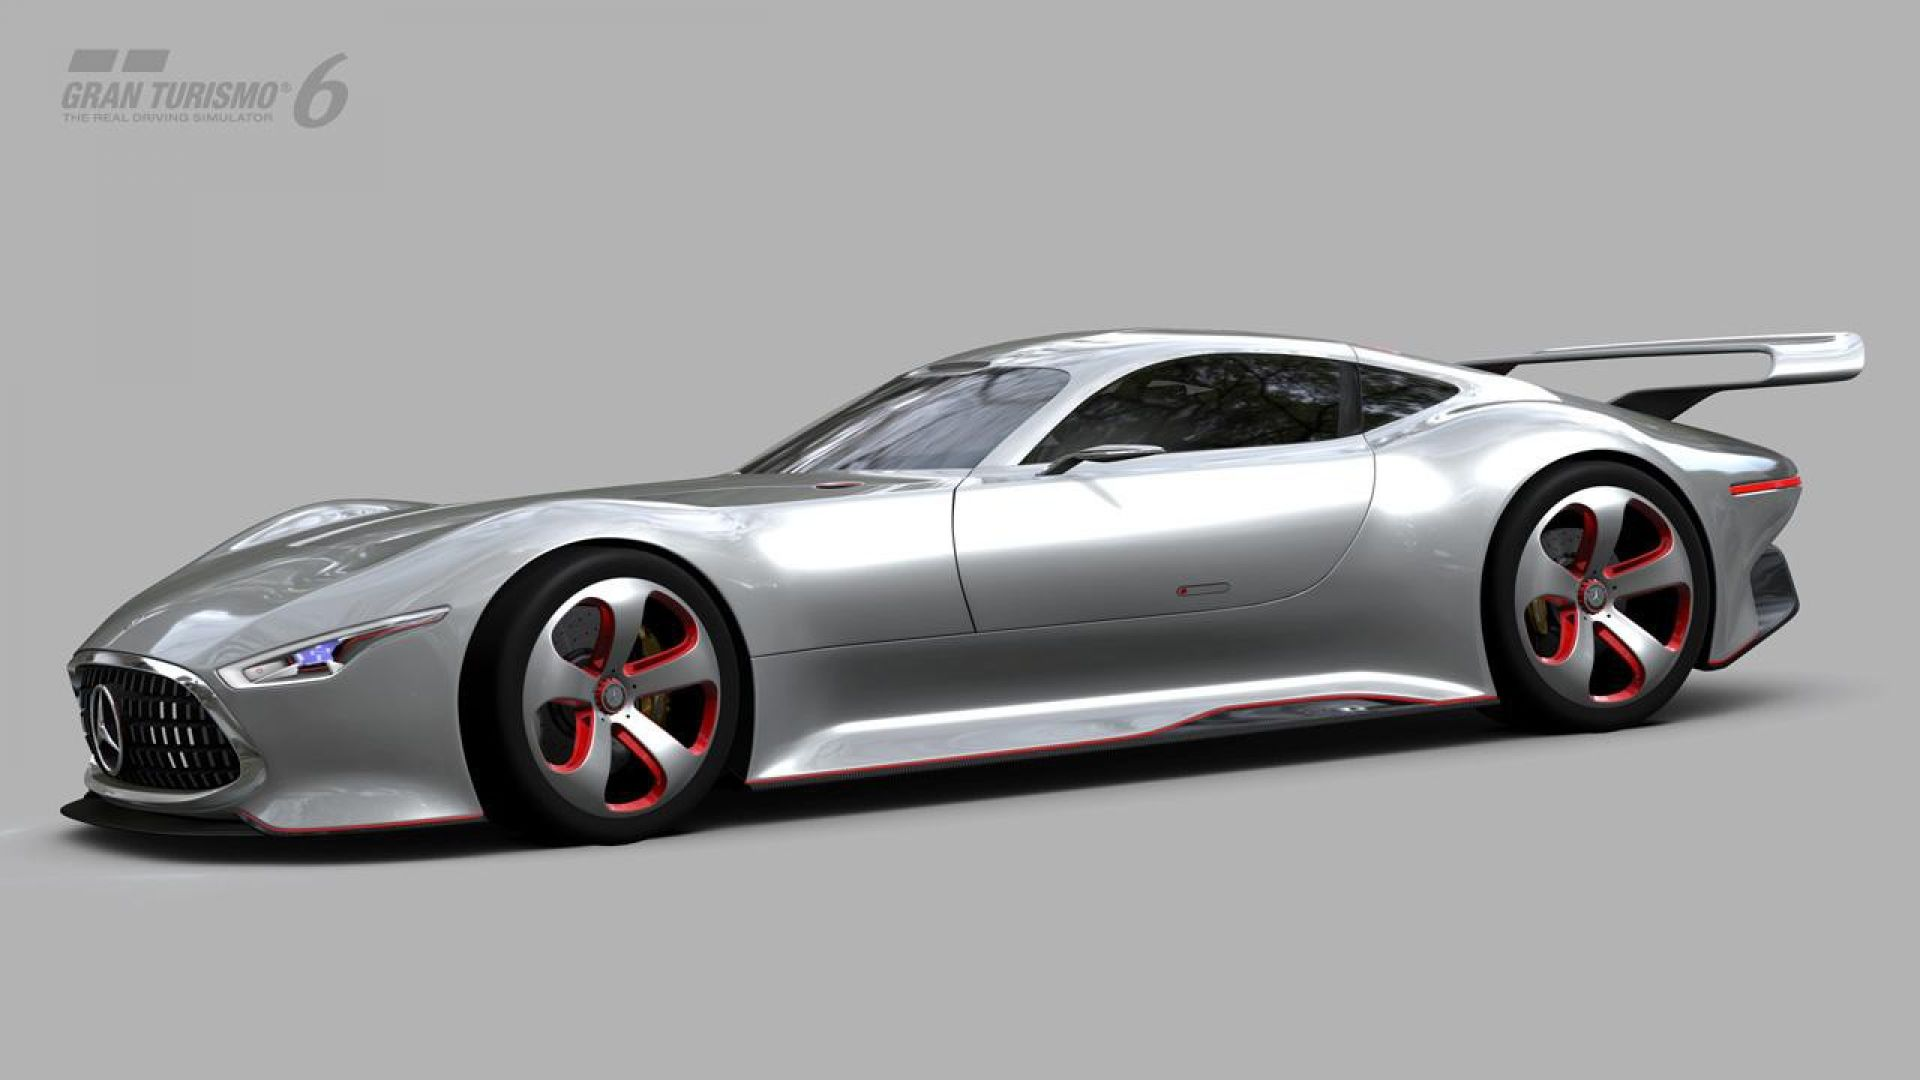 Free Wallpaper Ferrari Car Hypercar Mercedes Amg Il Motore Della F1 Per La Futura